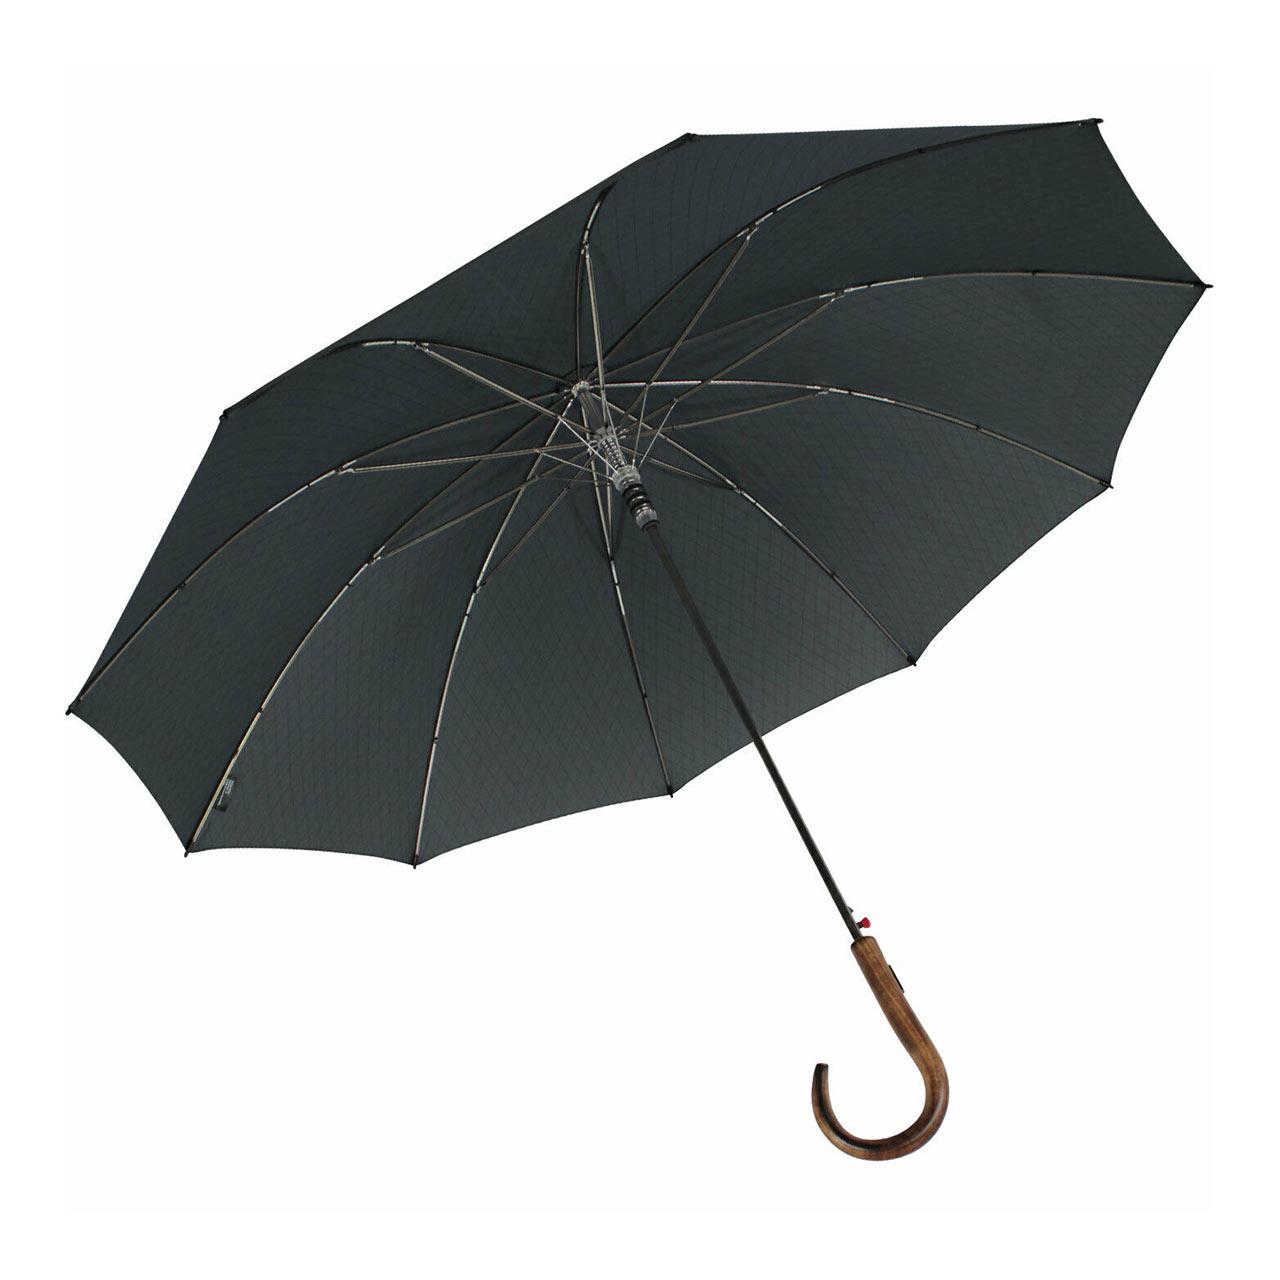 KNIRPS stick umbrella SL 923 Diamonds | the design gift shop